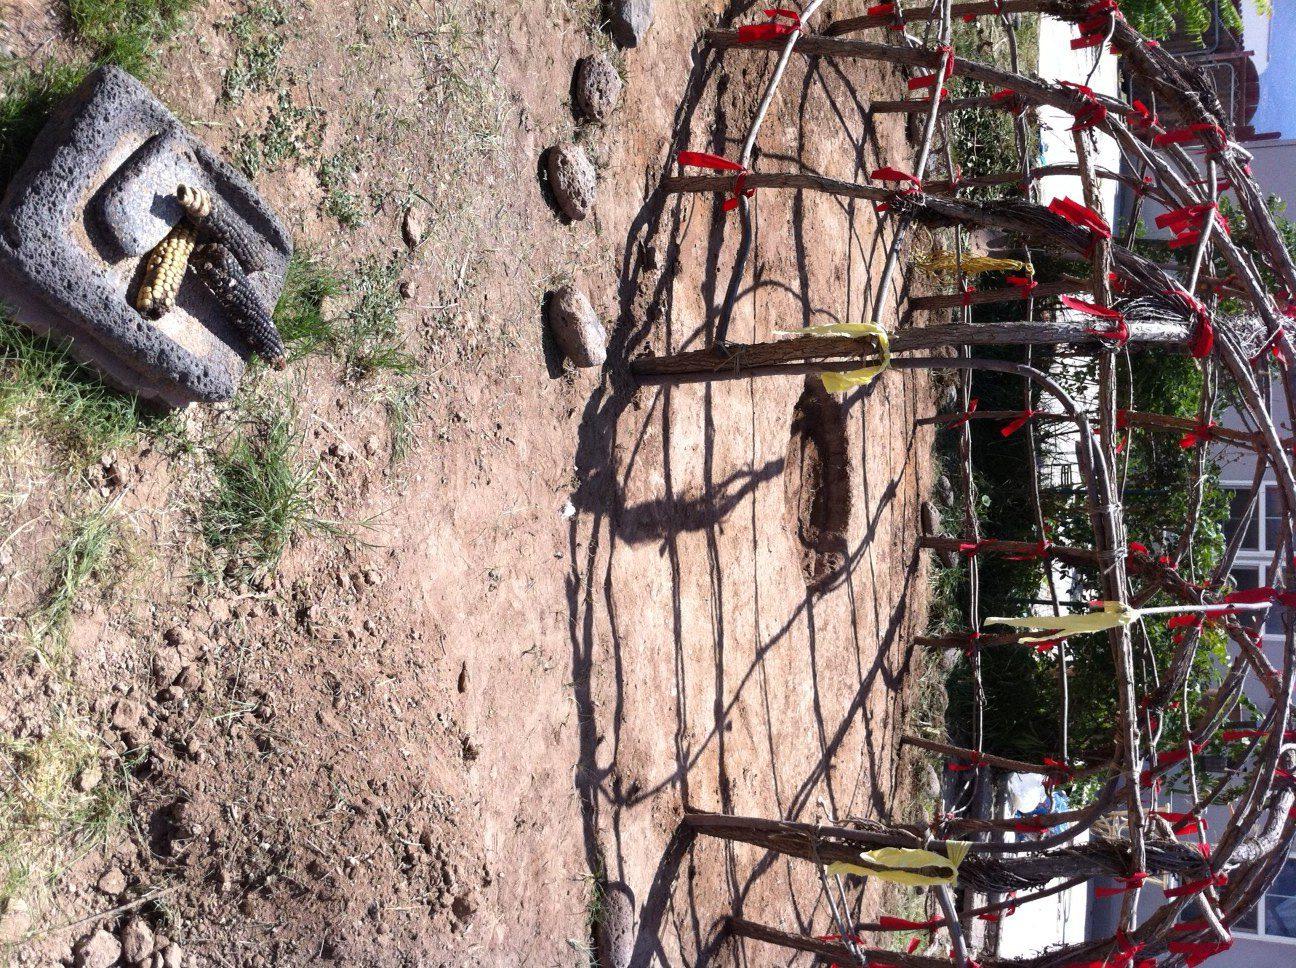 Sweat lodge cerermony in Sedona Arizona